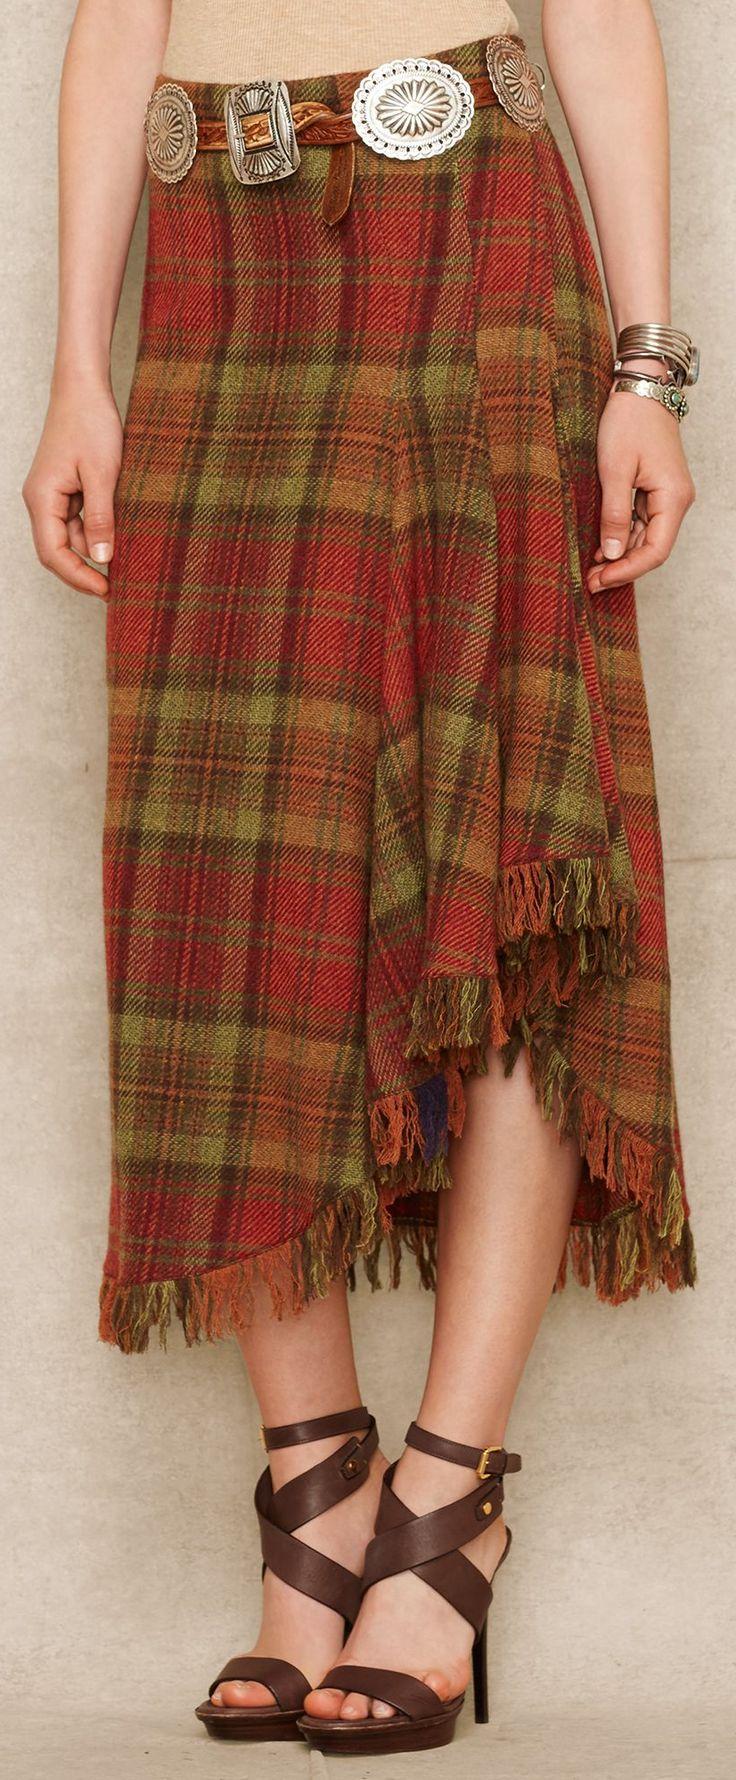 Love Ralph Lauren's take on the plaid skirt. Like a cosy blanket but still feminine and romantic.